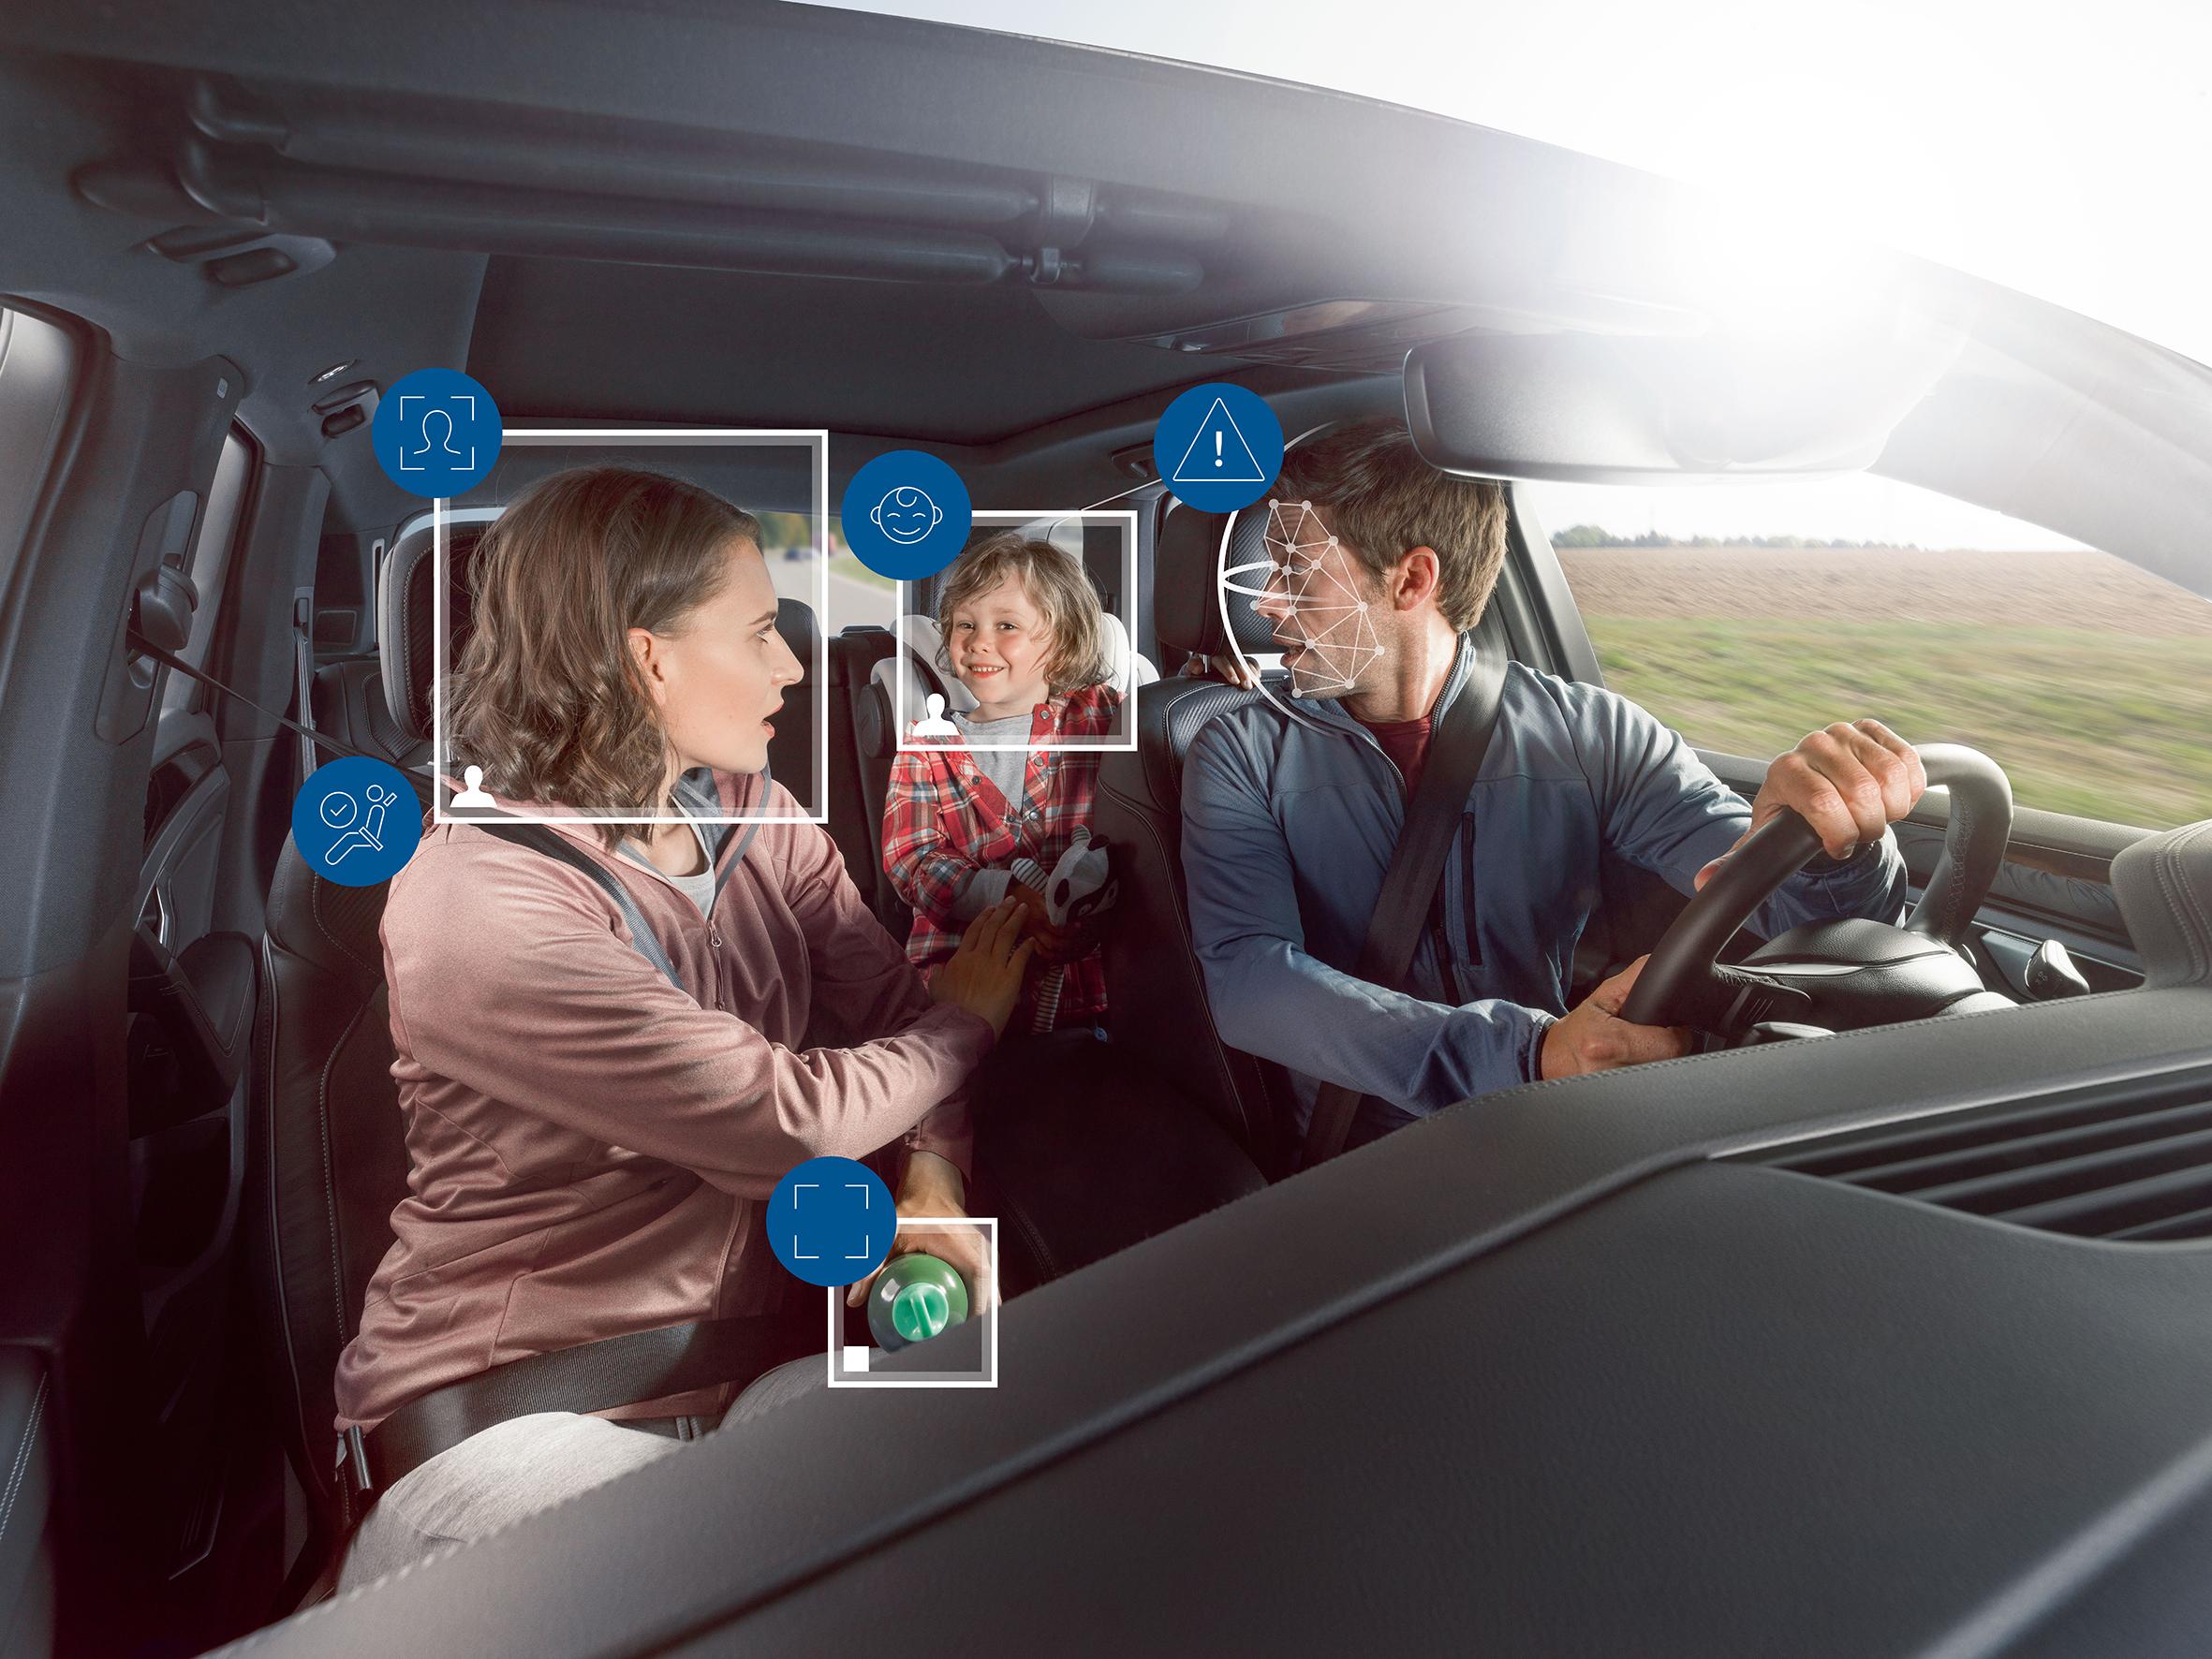 Bosch pomaga samochodom mieć oko na pasażerów